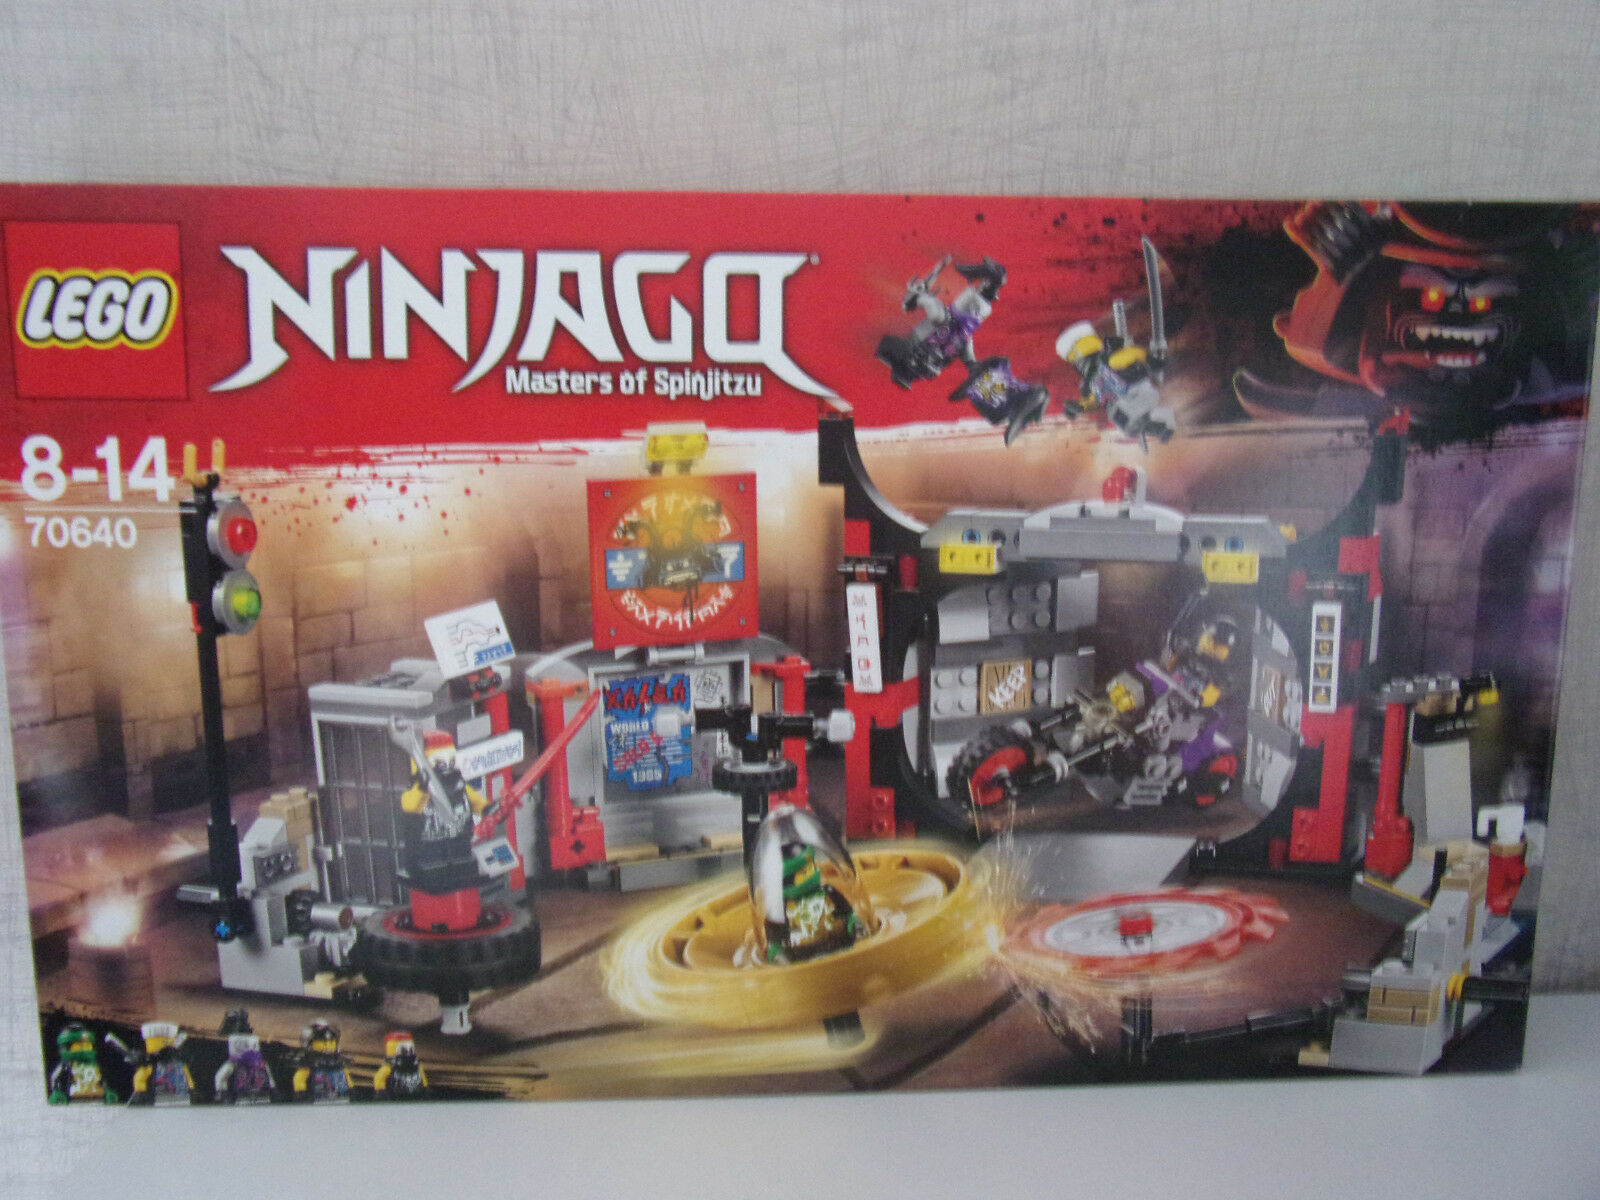 LEGO Ninjago Master of Spinjitzu 70640 quartier generale D. motorradf...  - NUOVO & OVP  distribuzione globale